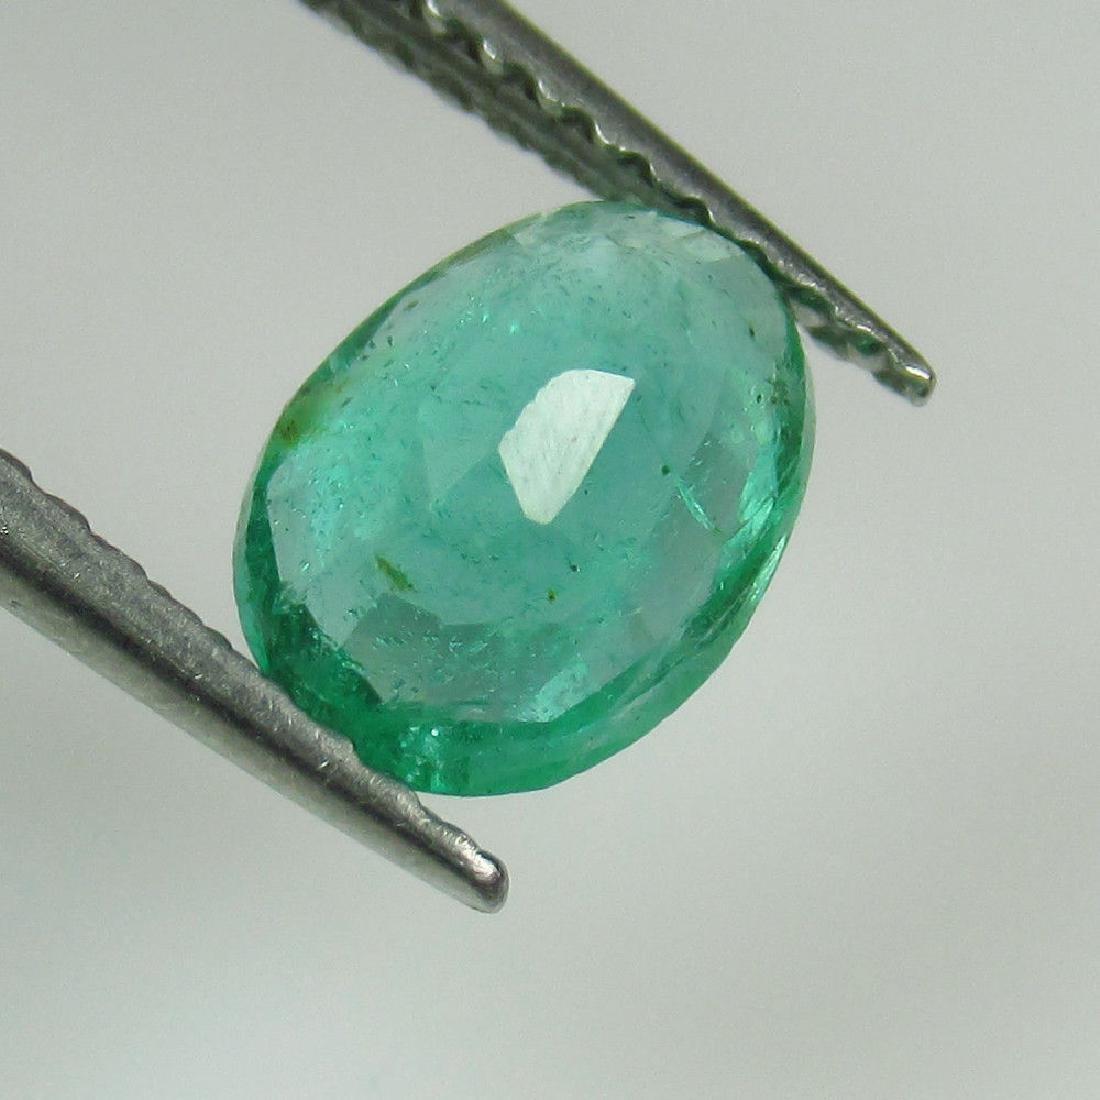 1.03 Ct Genuine Zambian Emerald Nice Oval Cut - 2